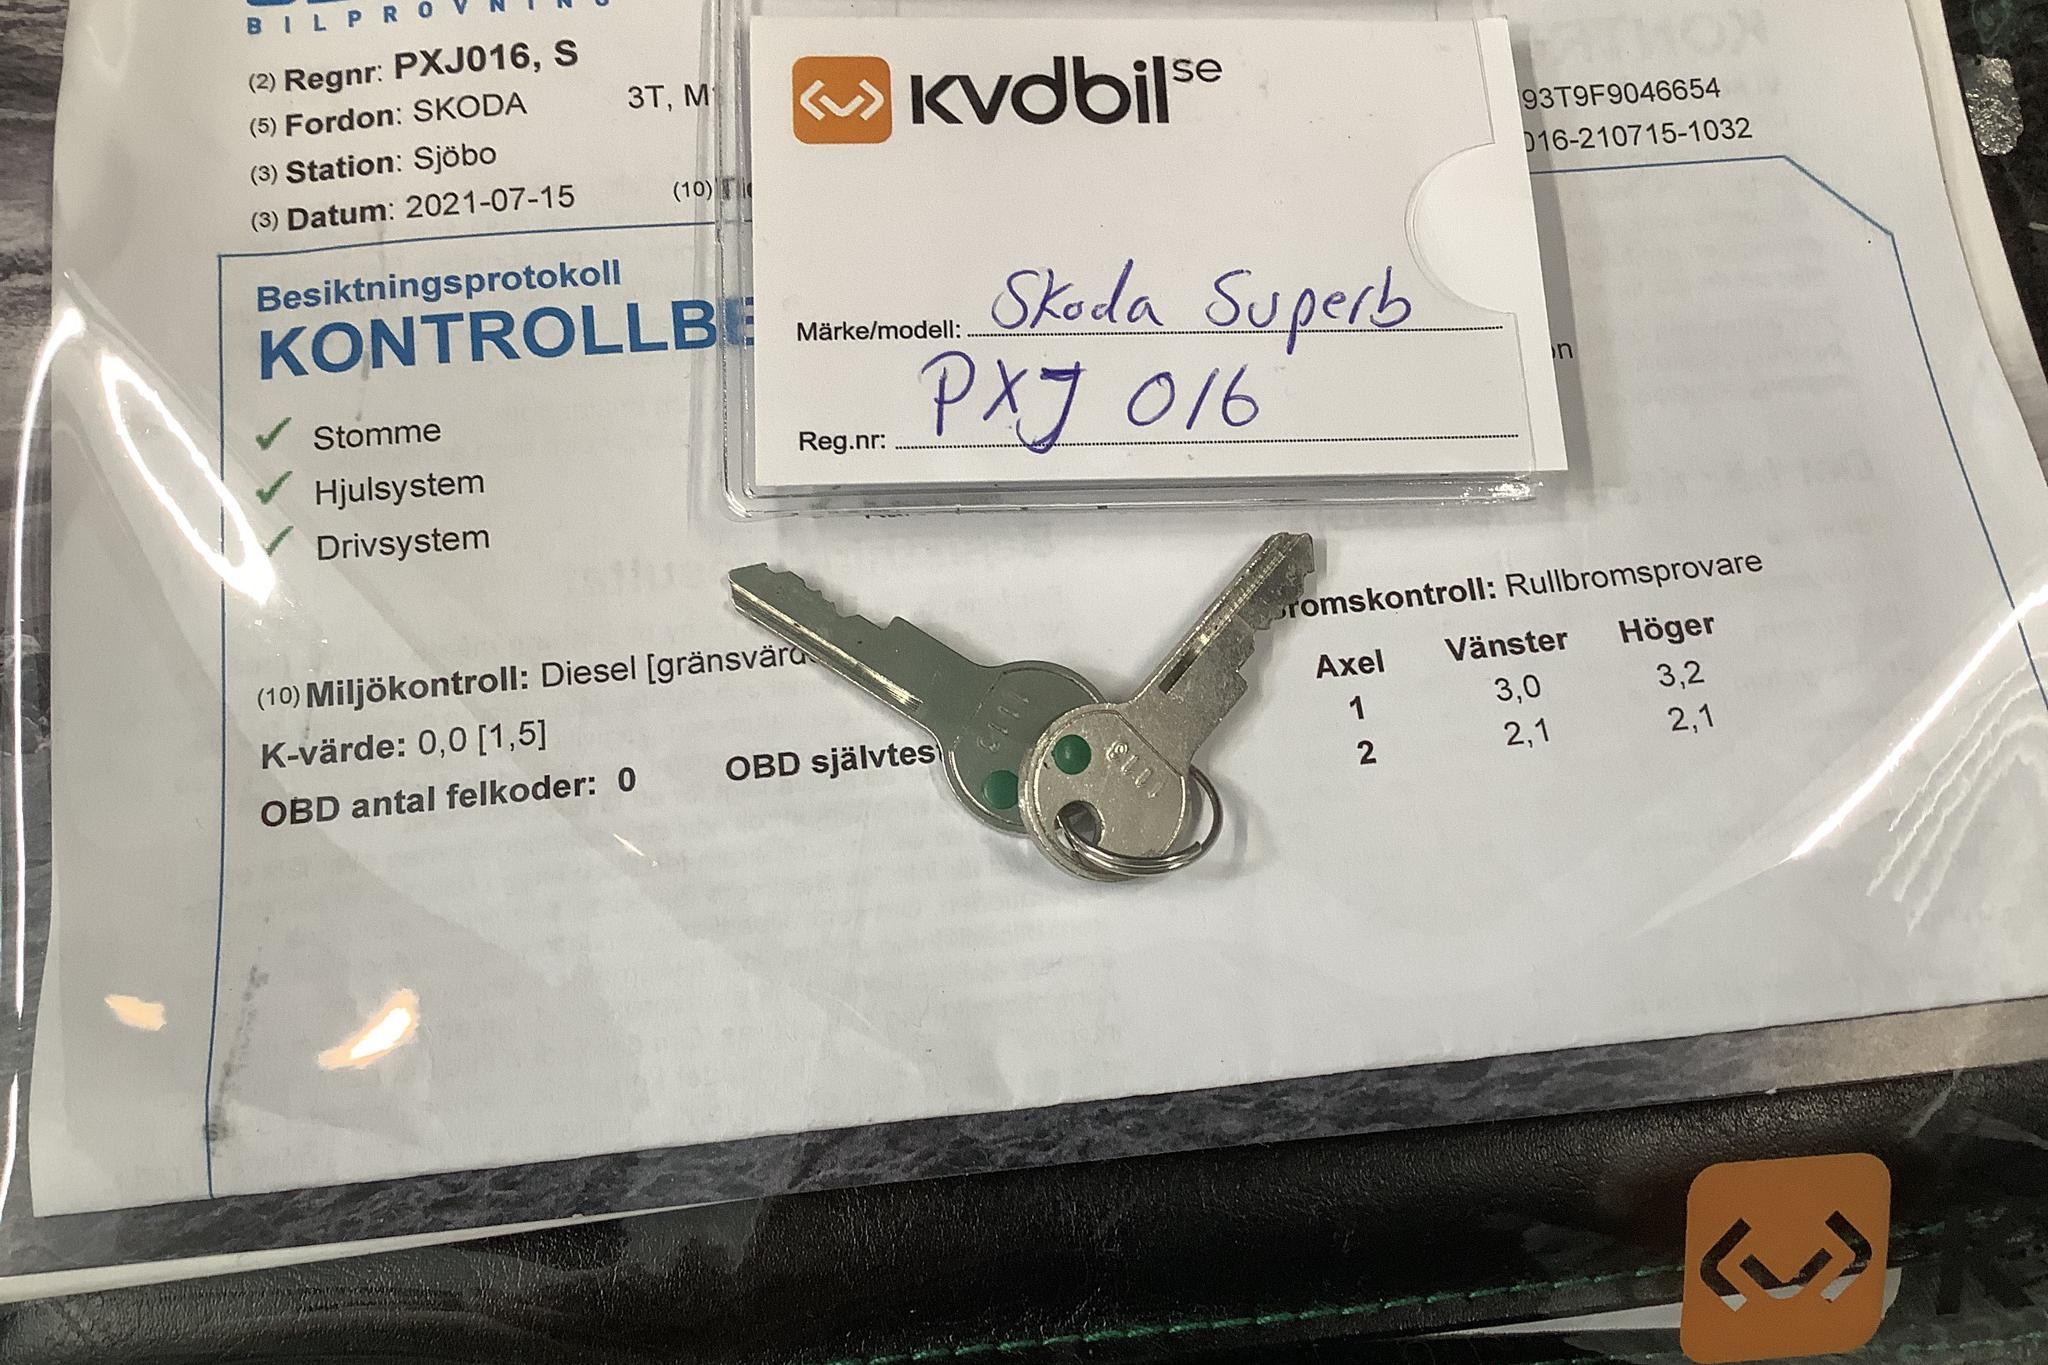 Skoda Superb 2.0 TDI Kombi (170hk) - 16 944 mil - Manuell - Light Brown - 2015